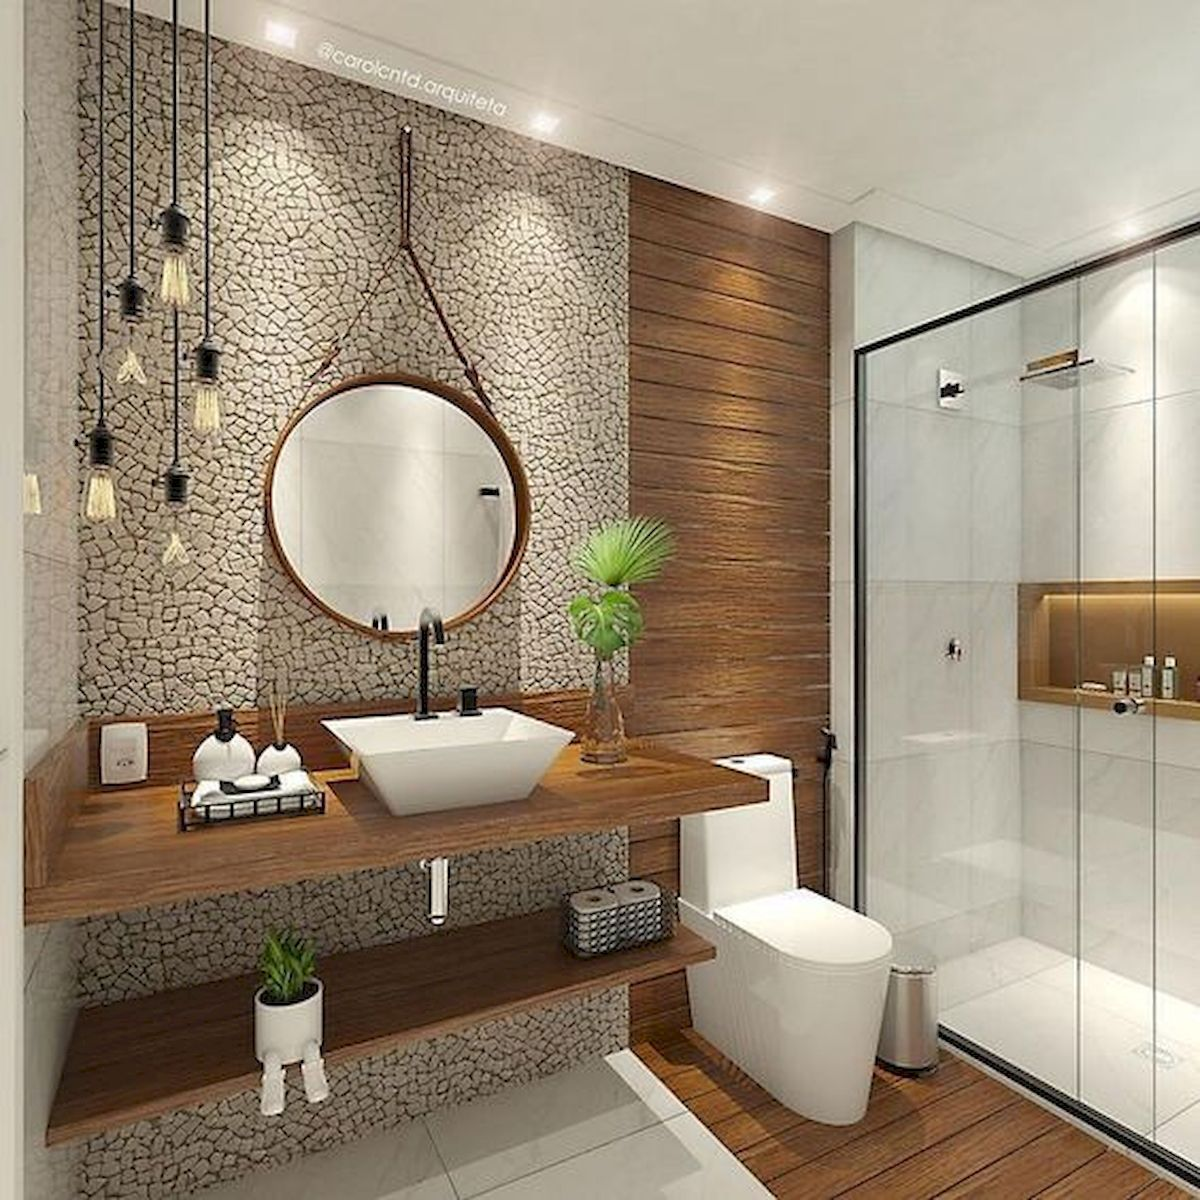 60 Elegant Small Master Bathroom Remodel Ideas 15 Bathroom